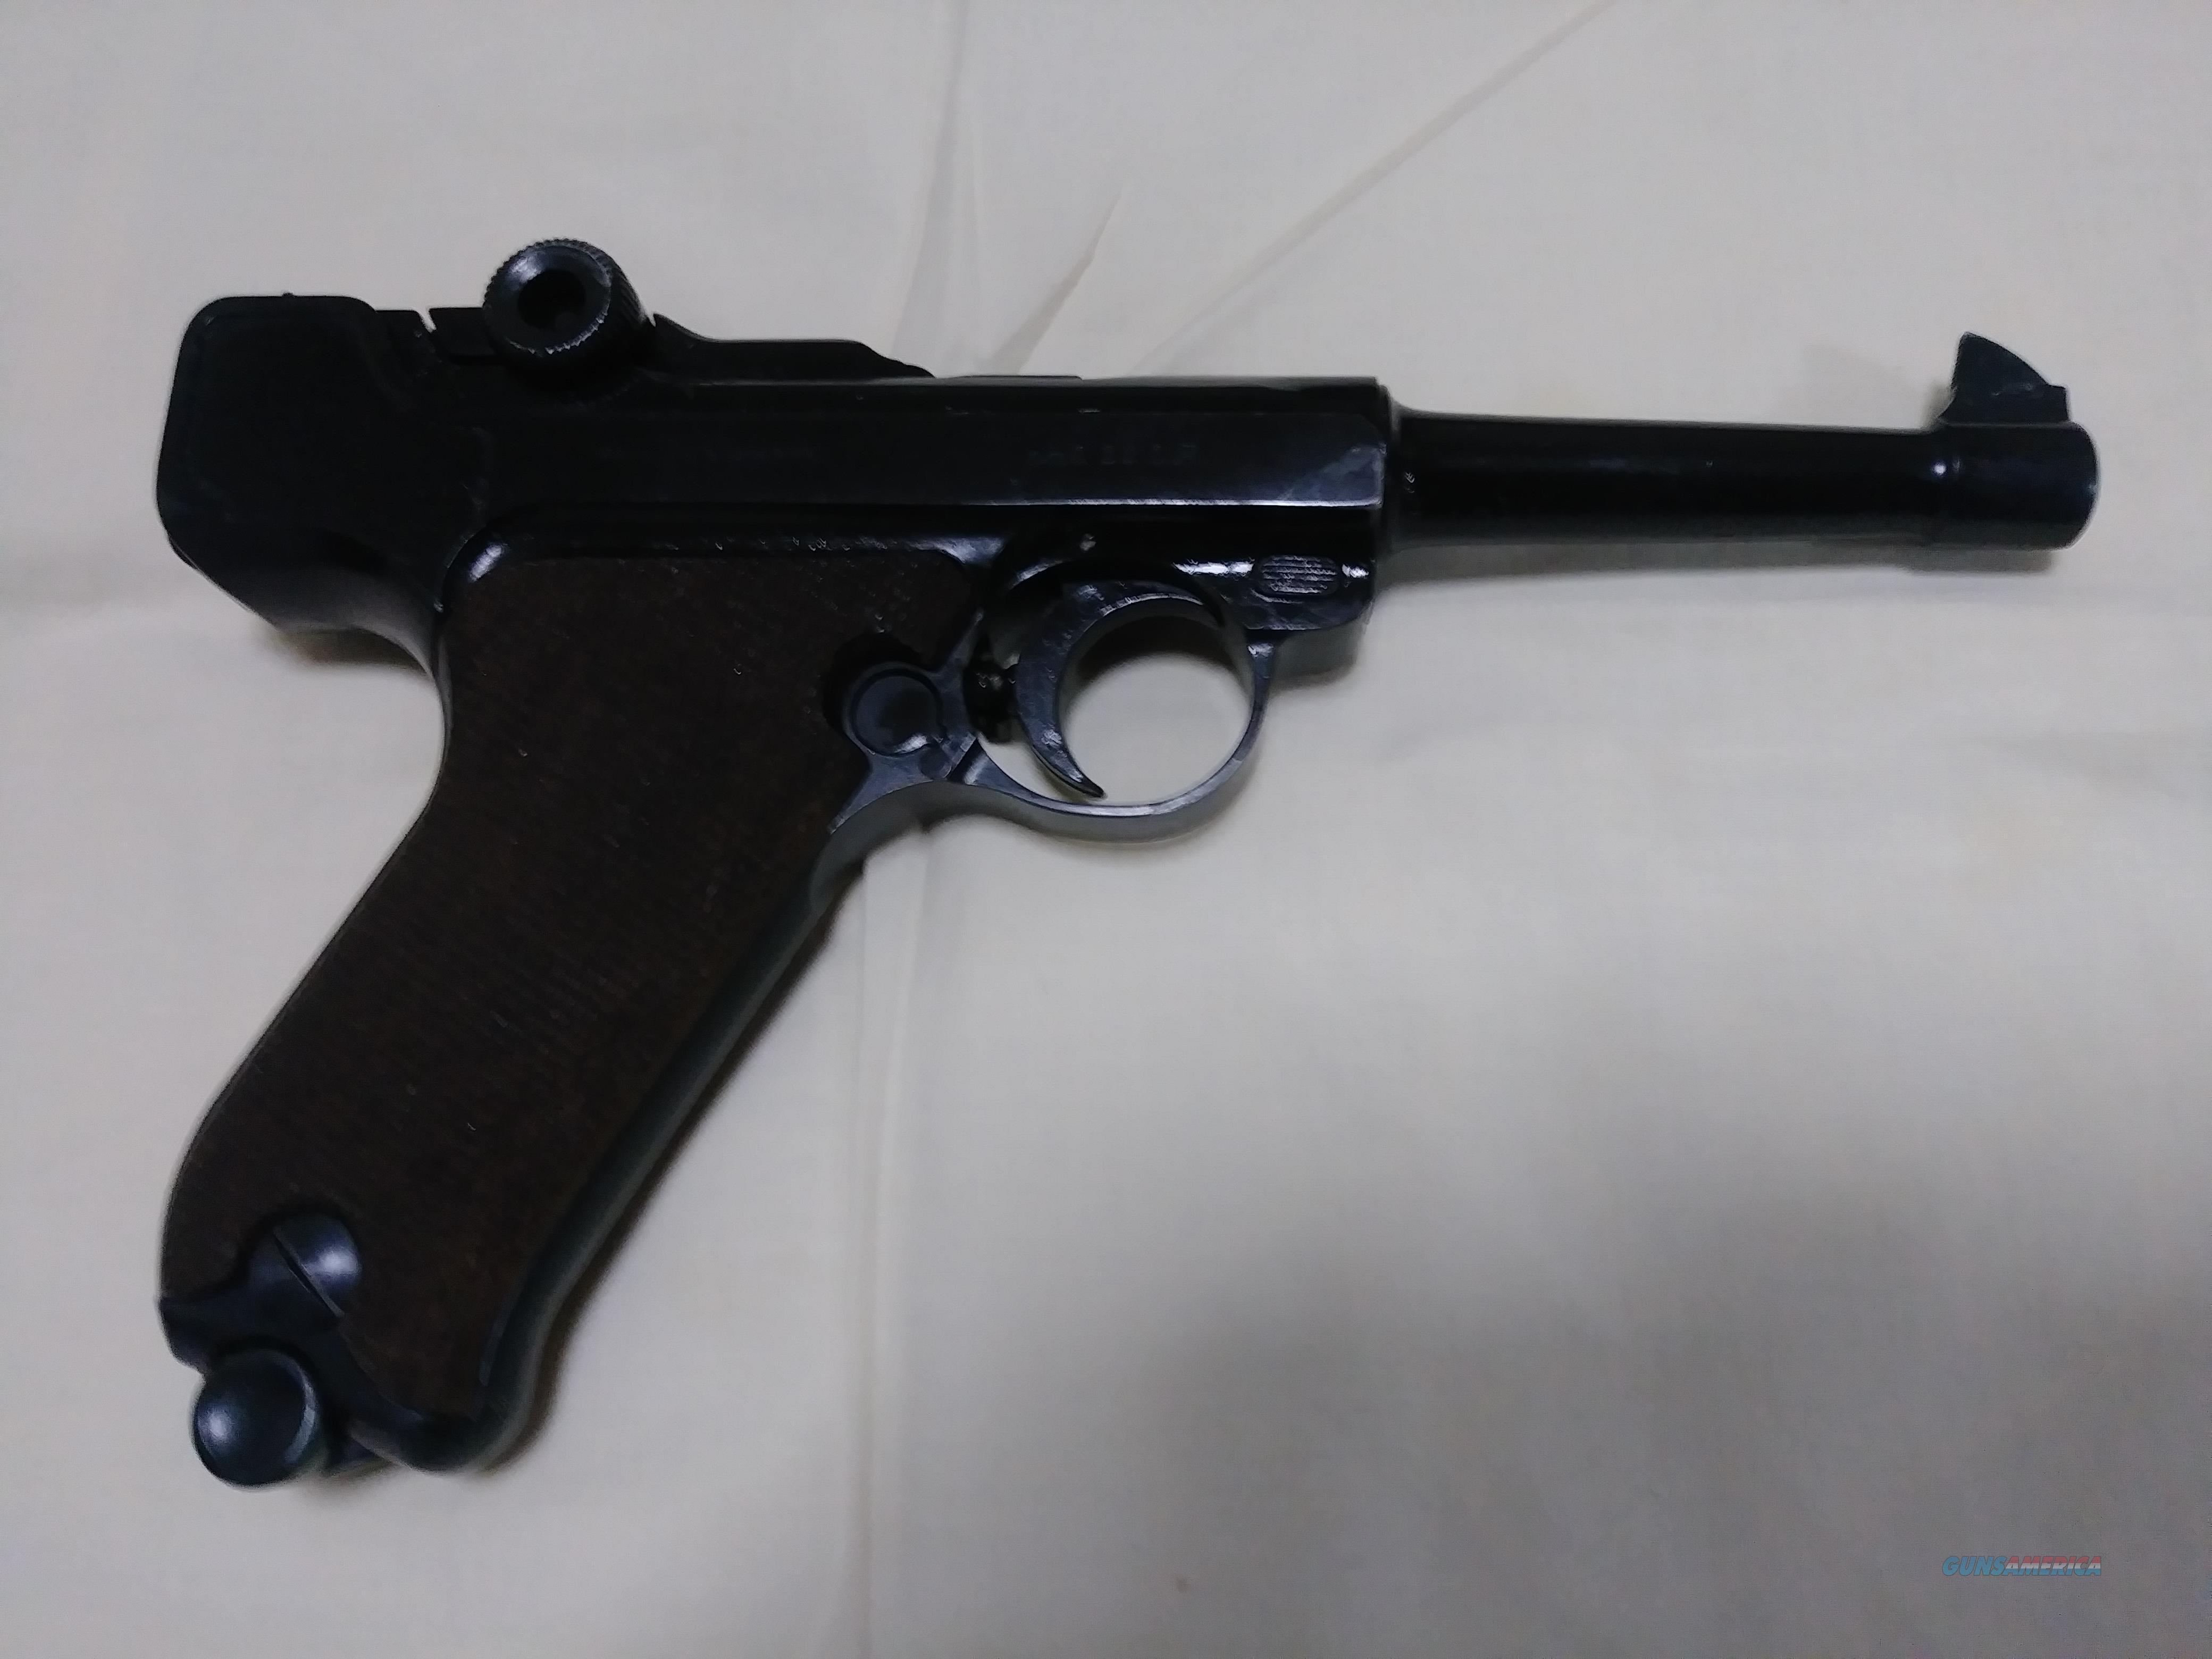 Stoeger Luger 22 long Rifle  Guns > Pistols > Luger Pistols